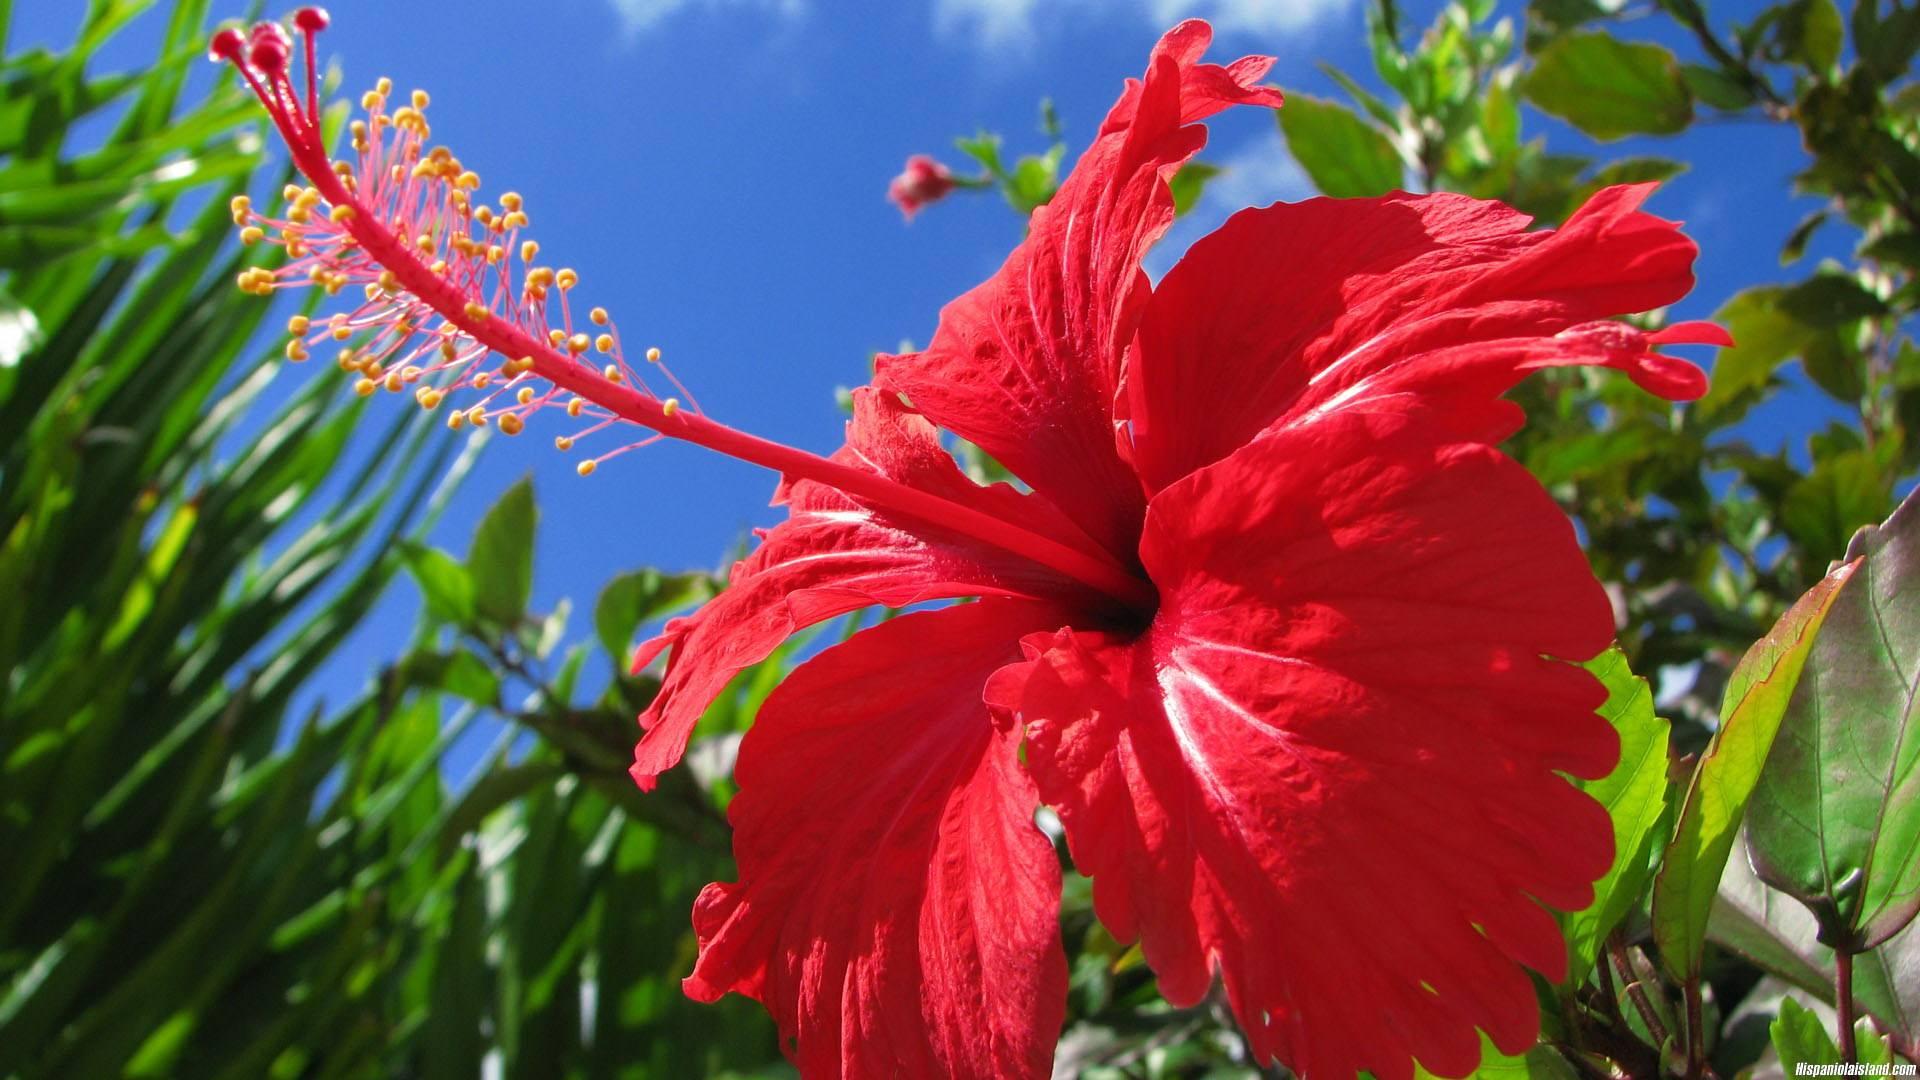 Хойя (восковой плющ): уход в домашних условиях, фото и названия видов, размножение, цветение + фото и видео